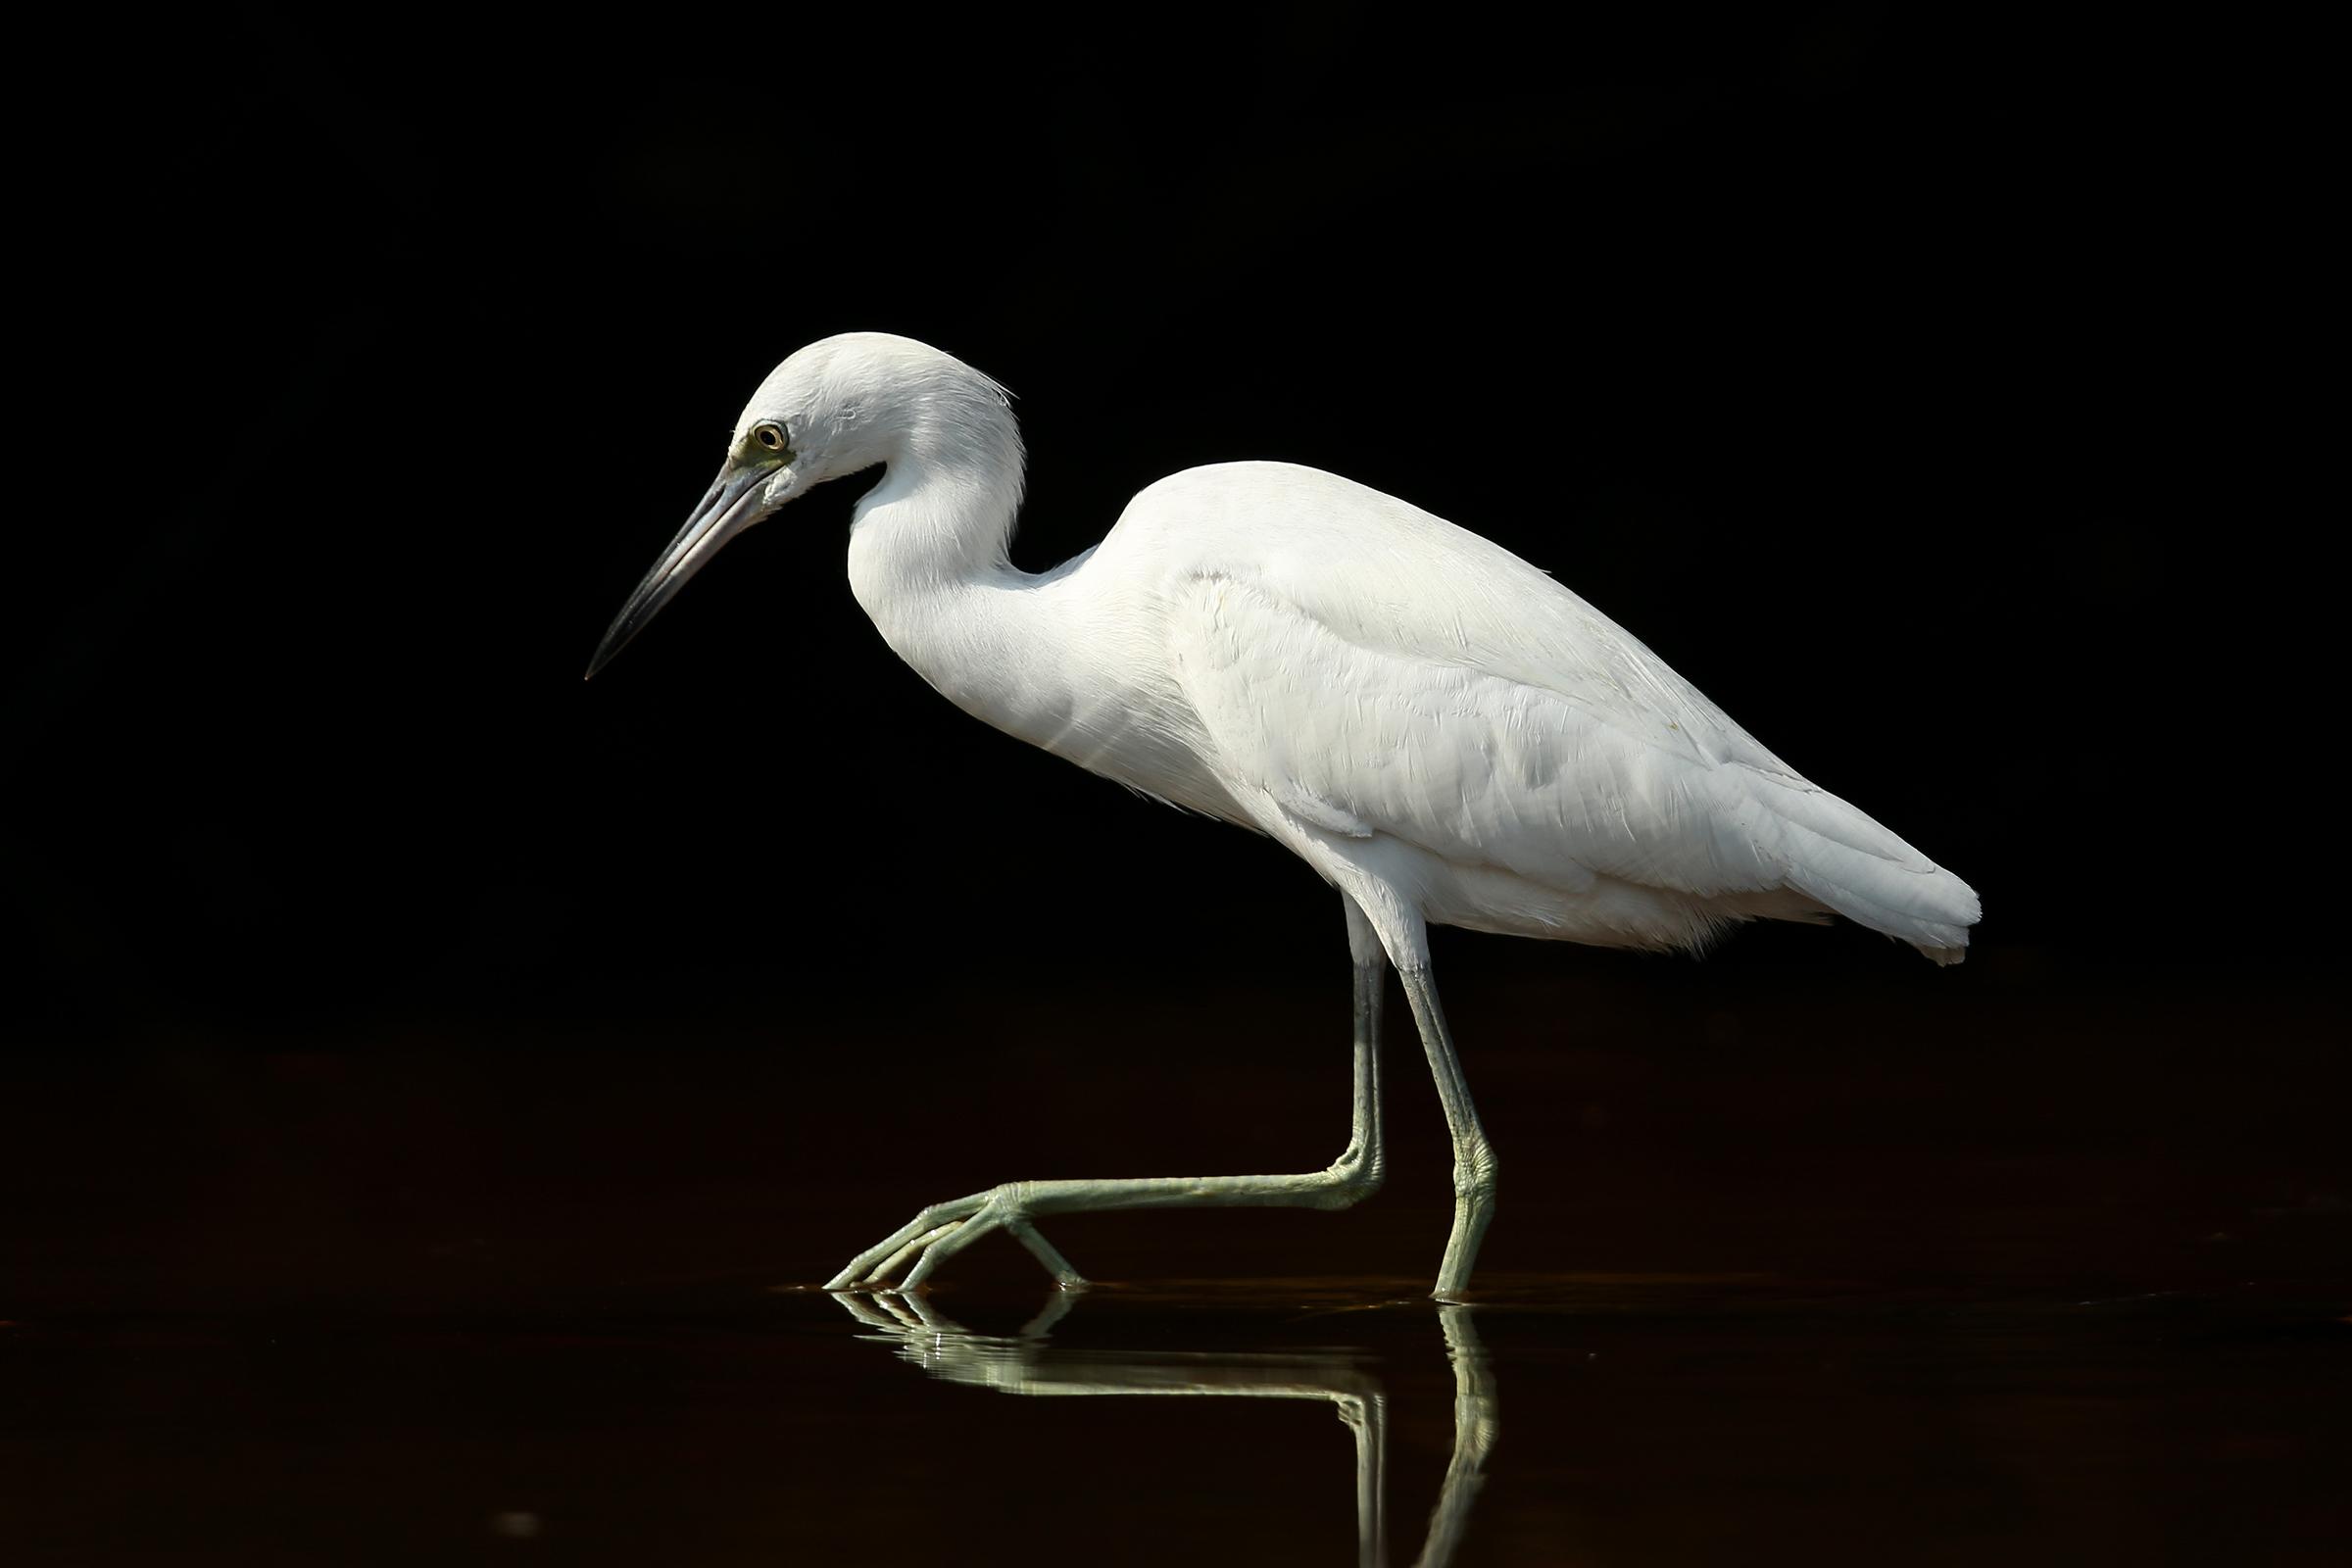 Little Blue Heron. Photo: Teri Franzen/Audubon Photography Awards.